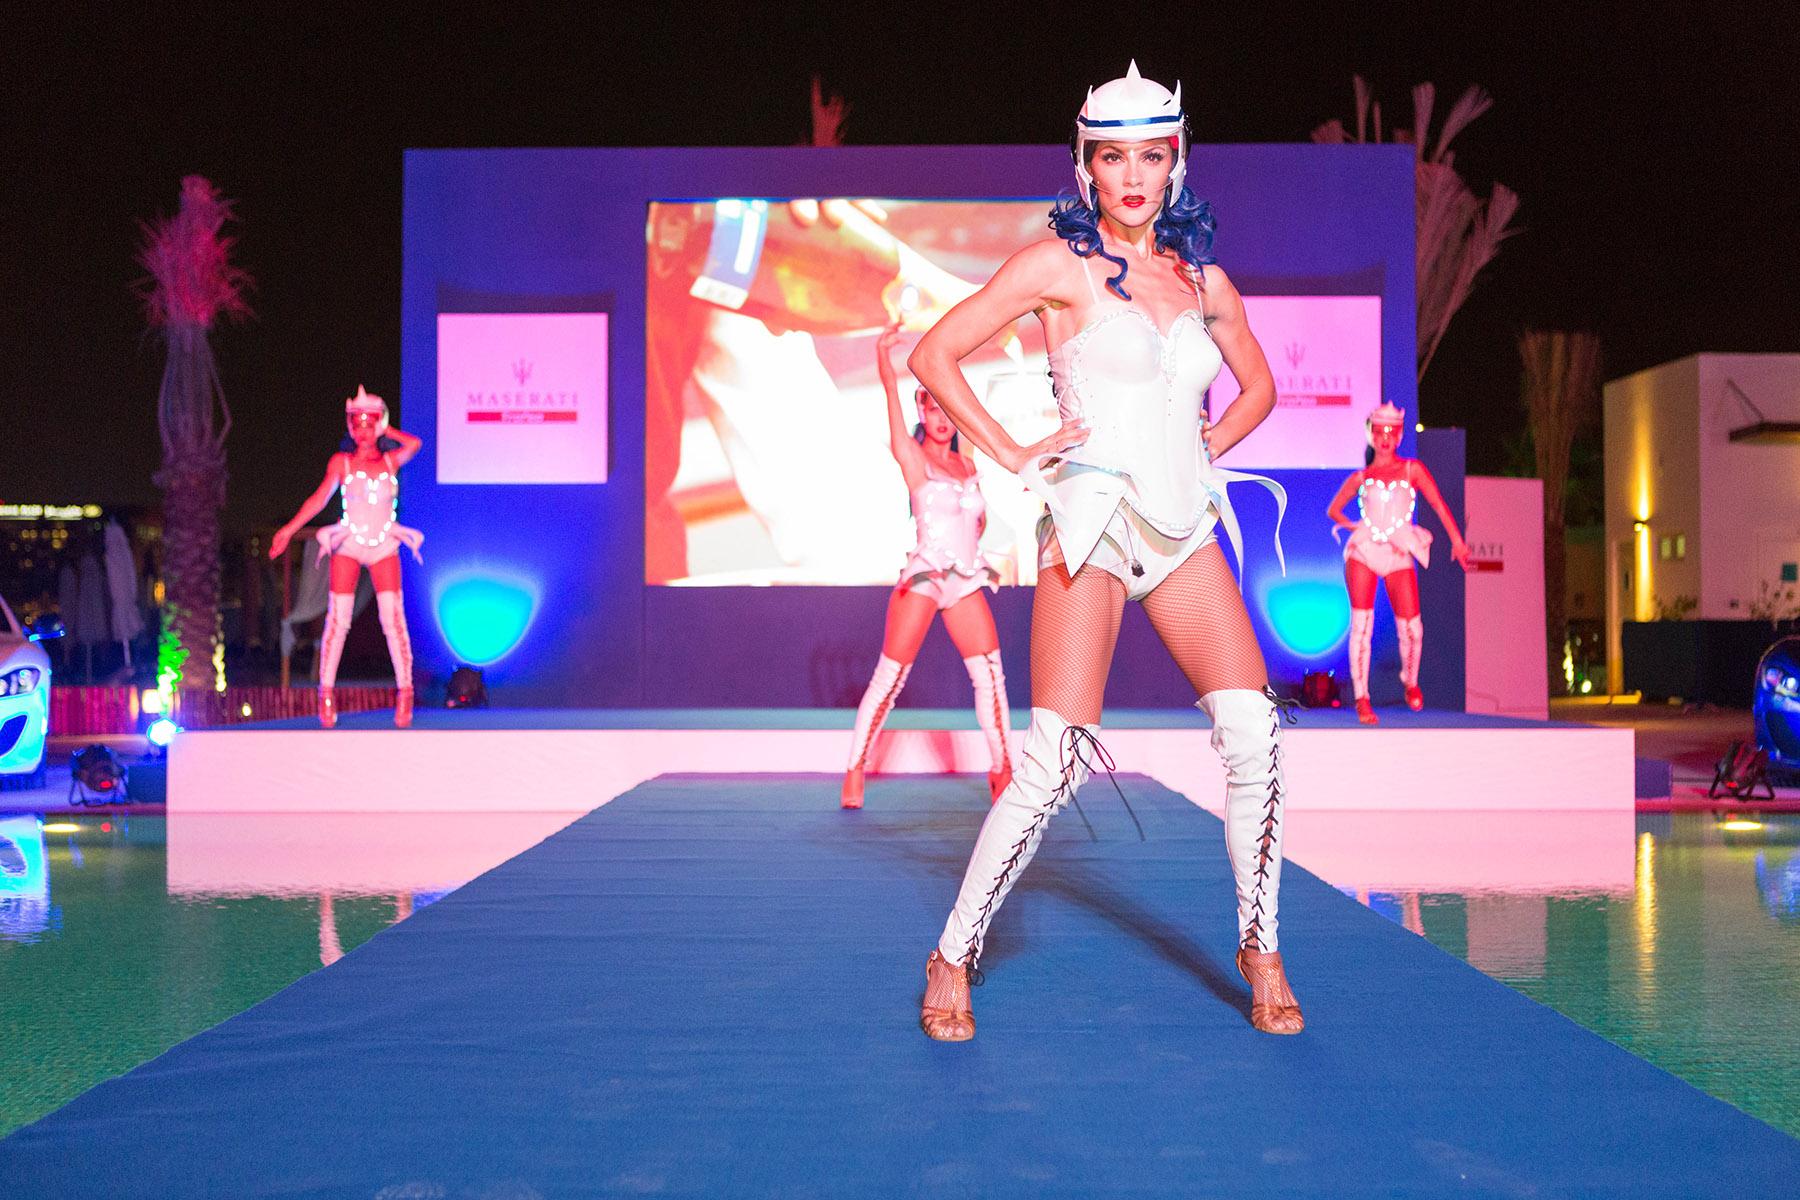 Dancers at the Maserati Trofeo event by Loesje Kessels Fashion Photographer Dubai